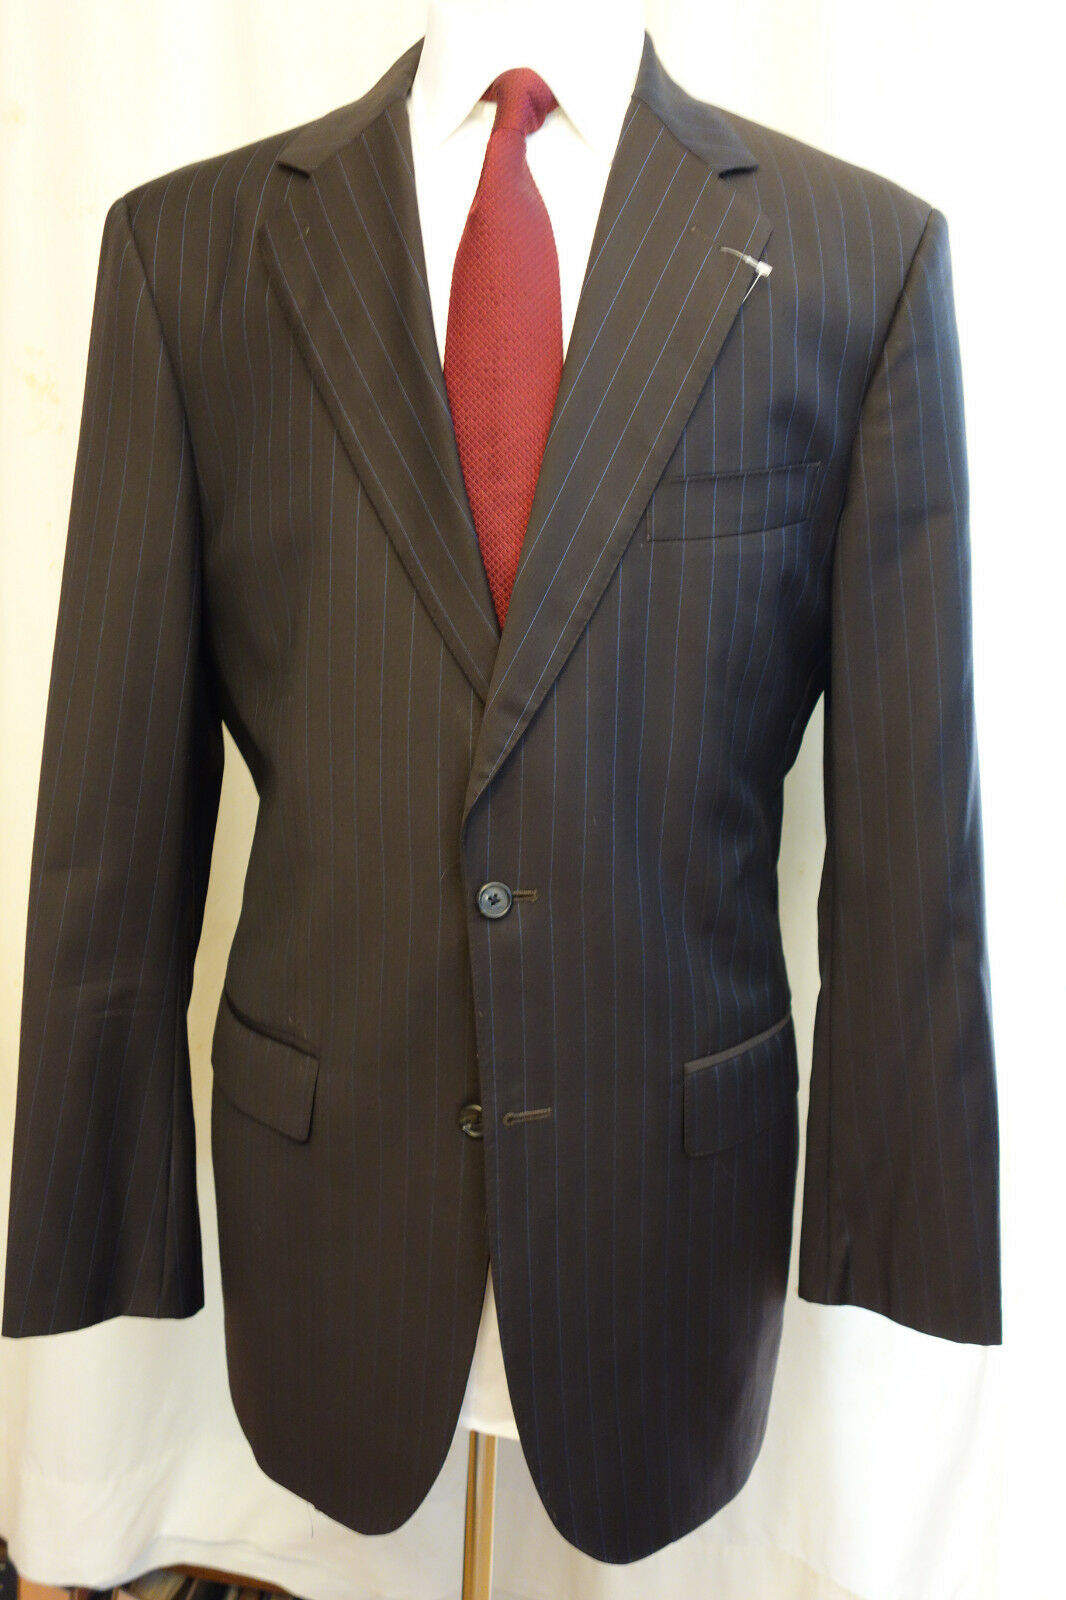 NWOT Brooks Brothers Custom TailoROT Braun Pinstripe Wool Suit 43L